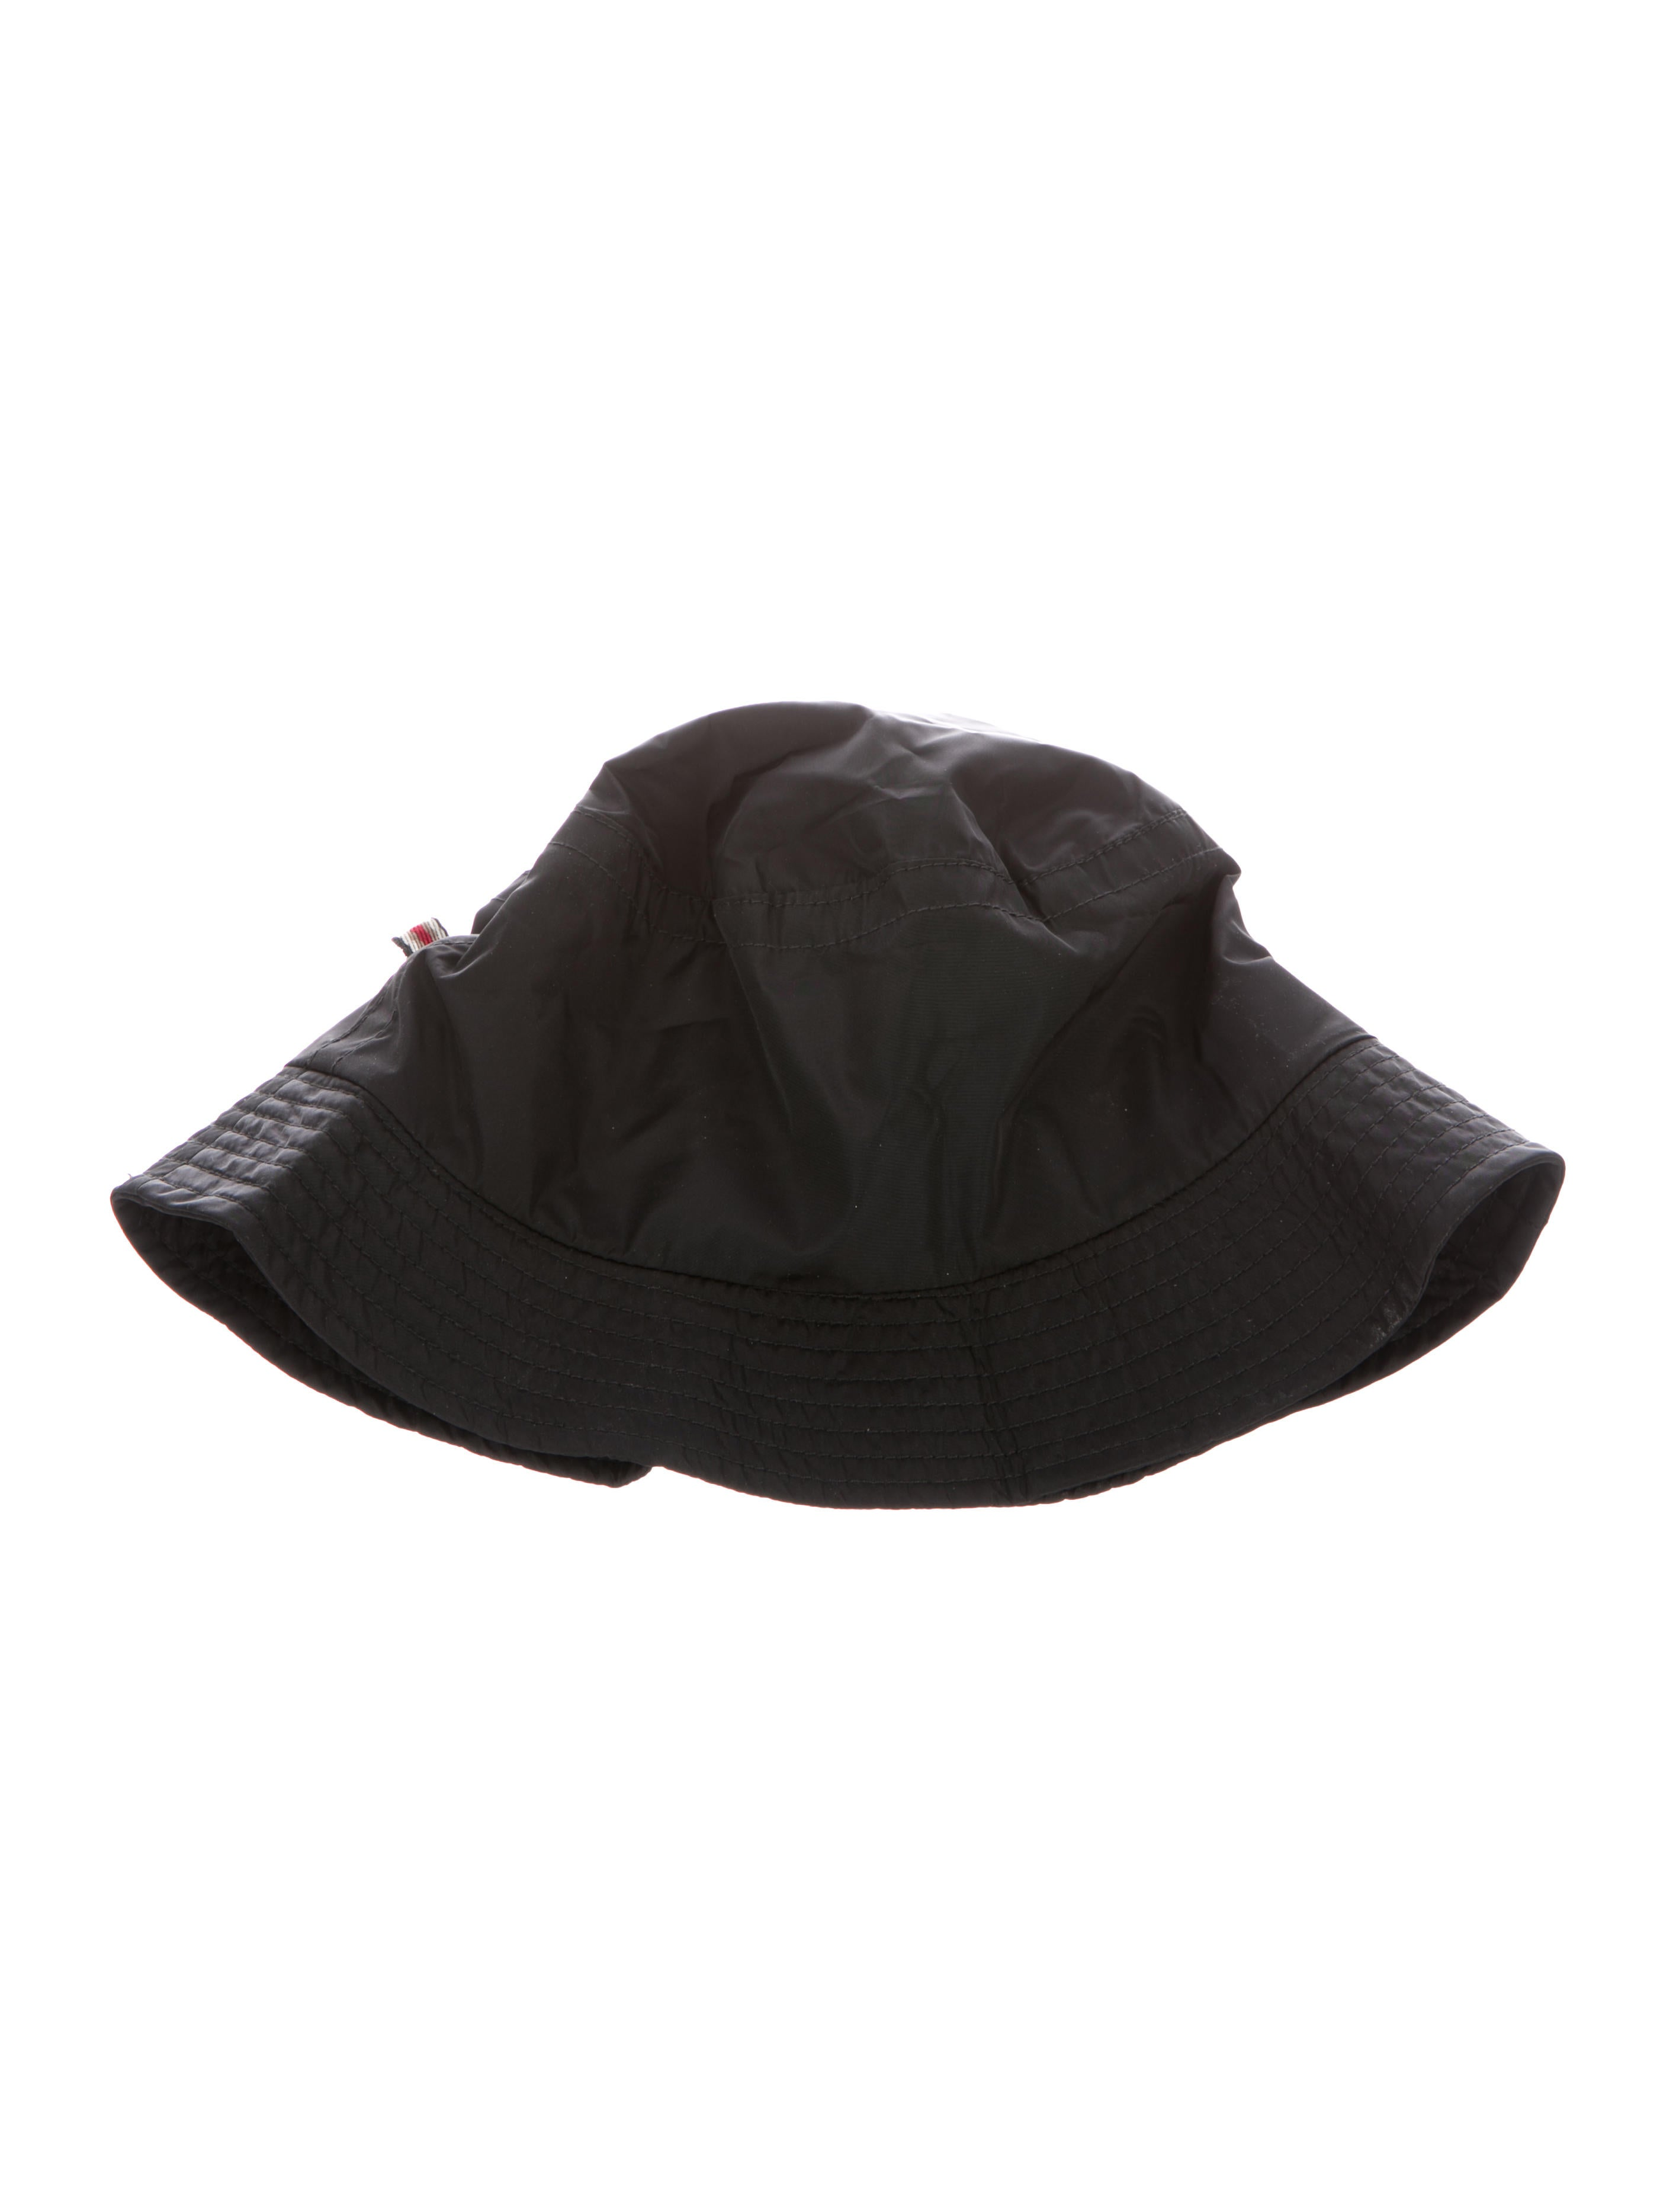 Burberry Woven Bucket Hat - Accessories - BUR97661  cdaeea73890